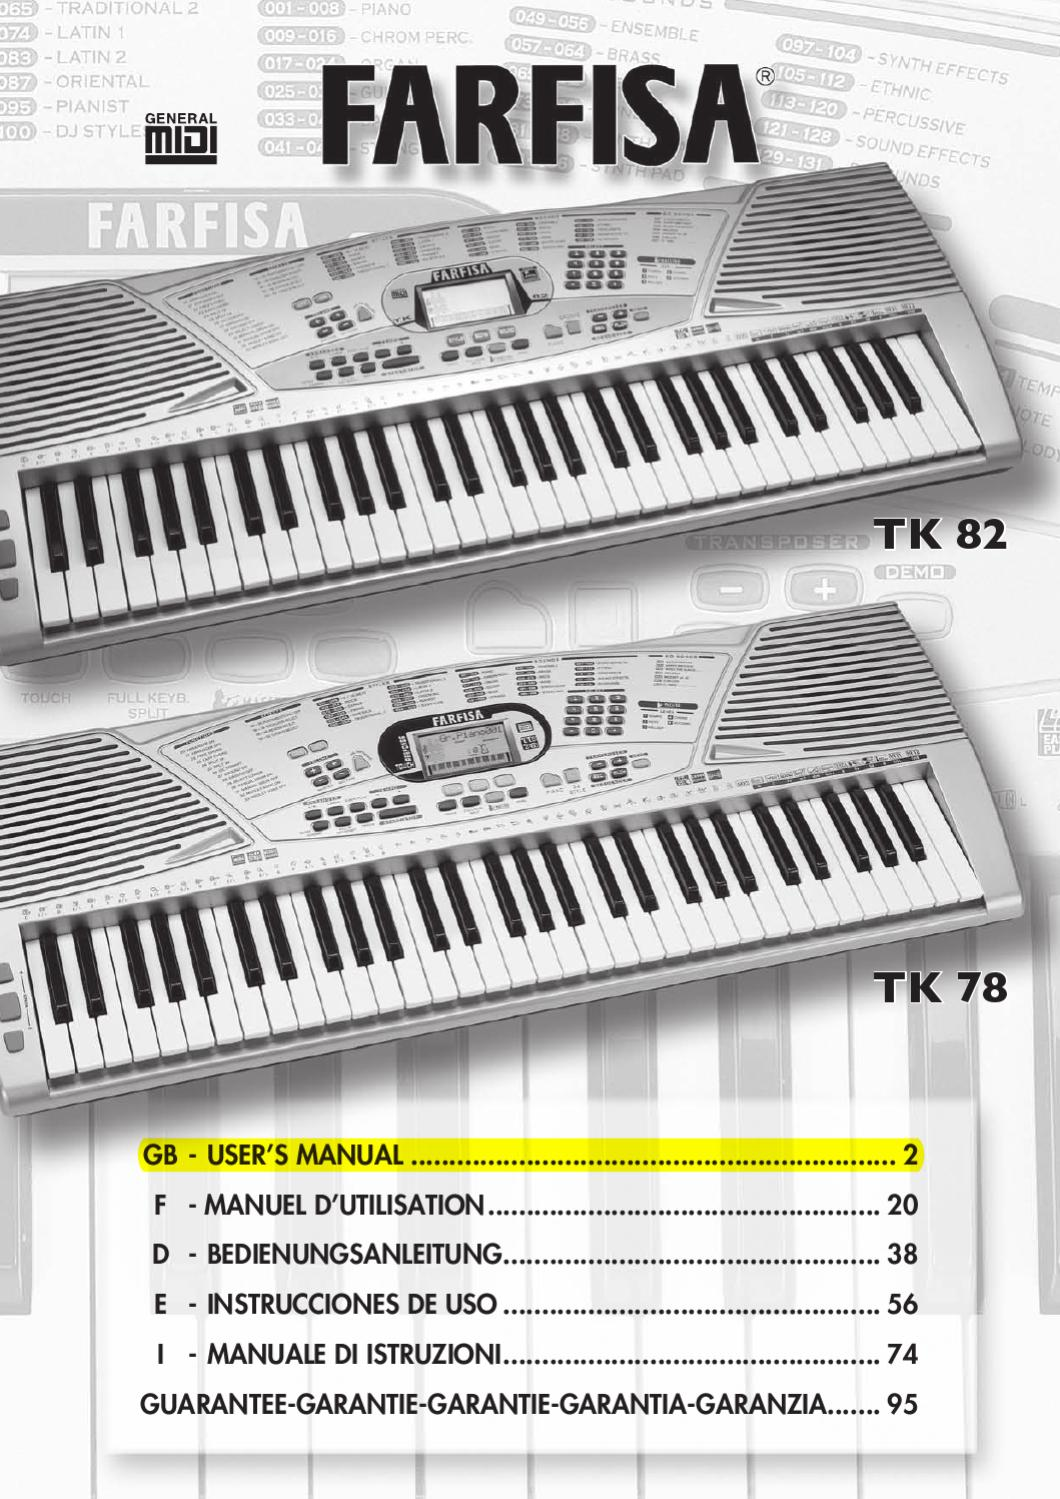 Teclado Digital FARFISA TK82 - Manual Sonigate by sonigate - issuu